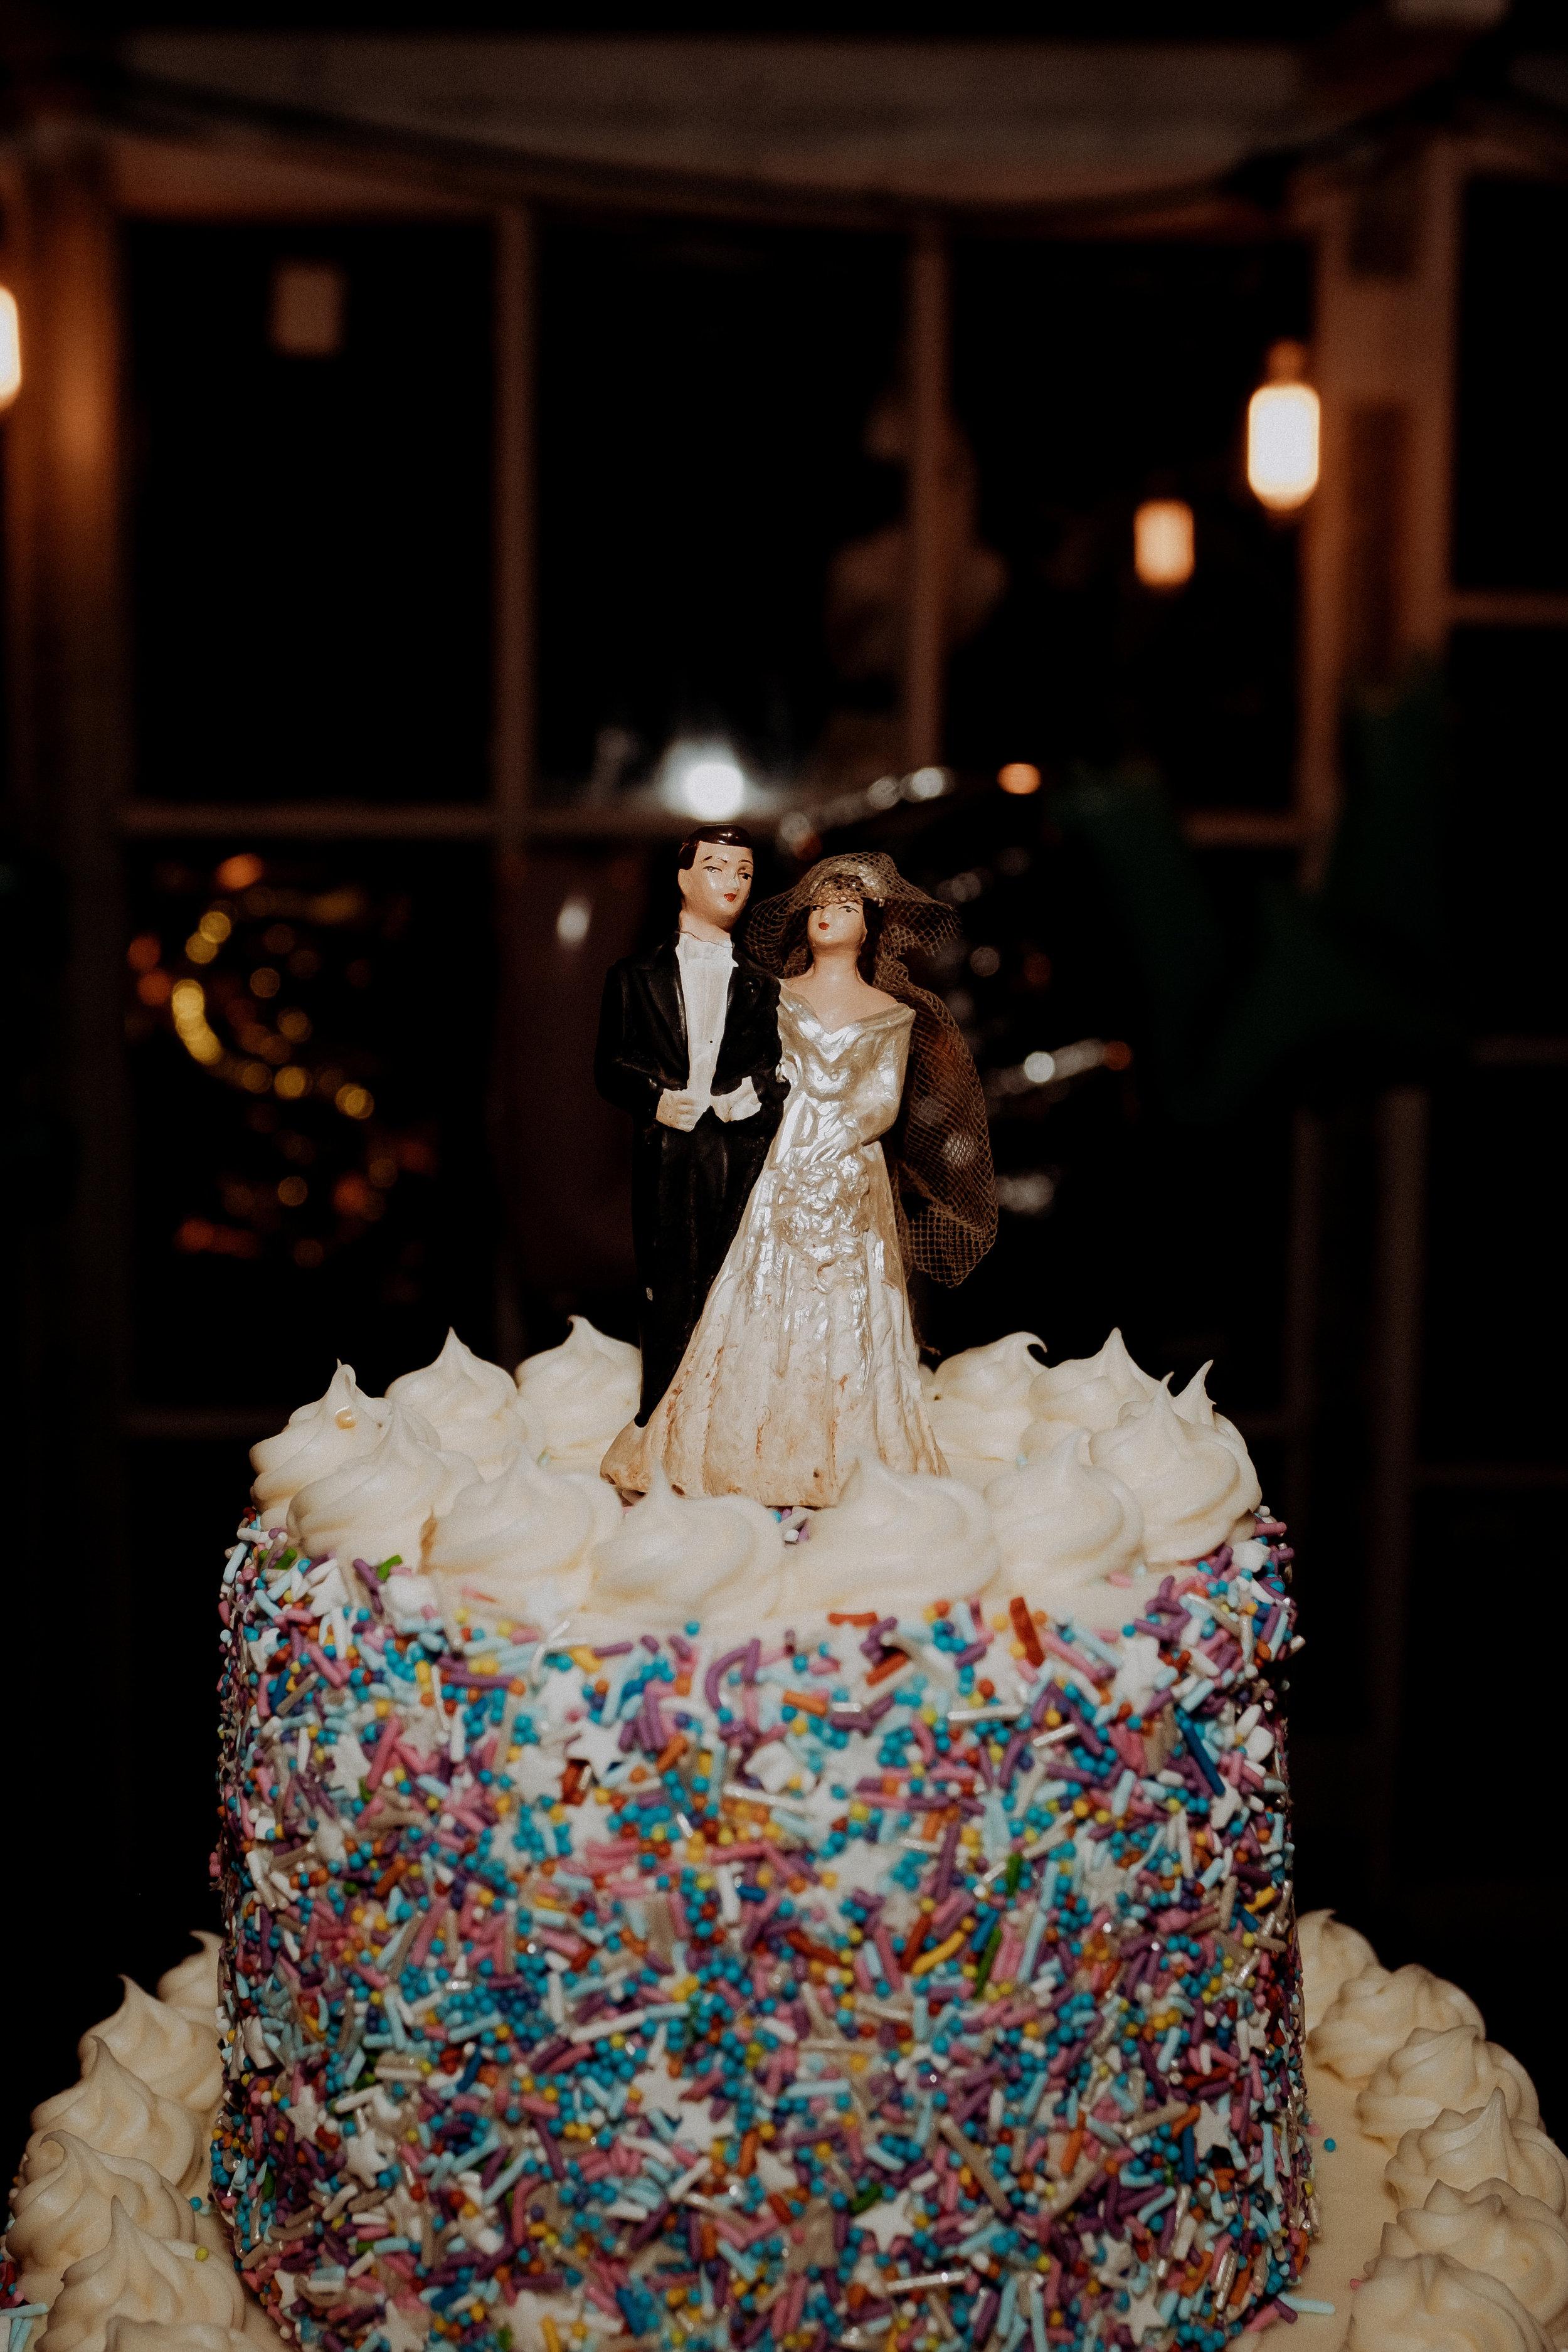 Chellise_Michael_Photography_Robertas_Brooklyn_Wedding_Photographer-712.jpg